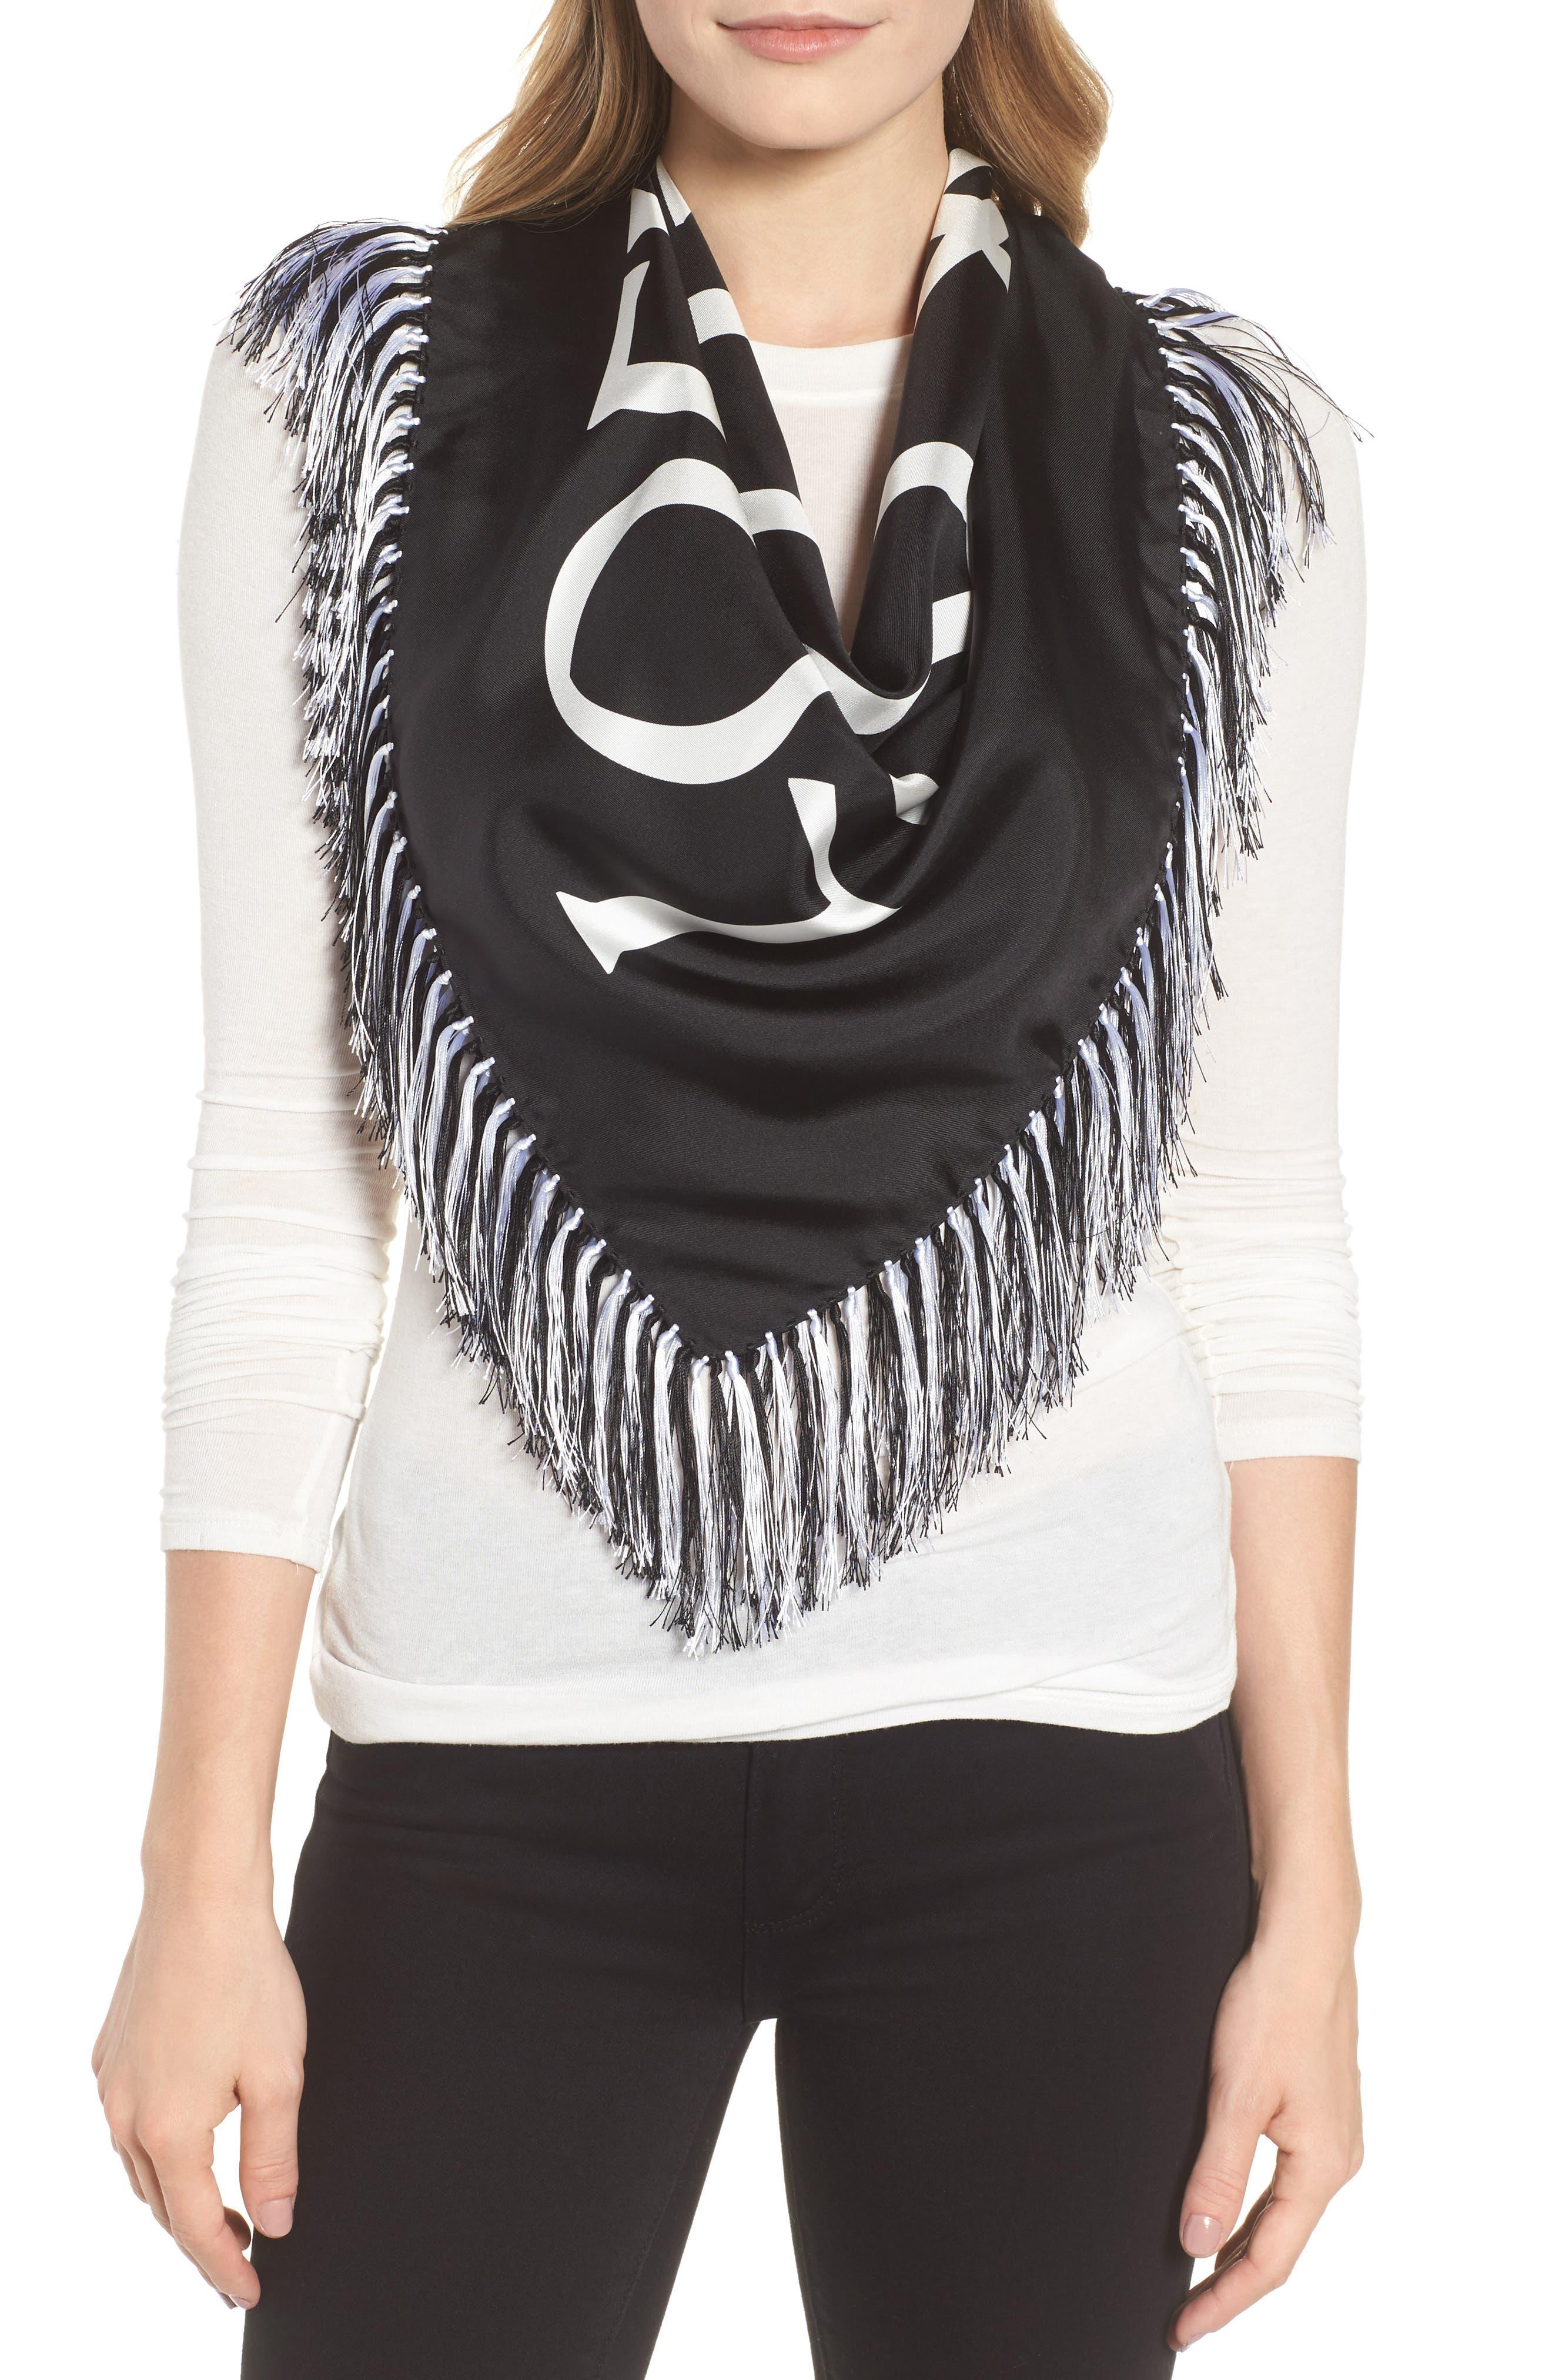 Anagram Silk Scarf,                             Alternate thumbnail 2, color,                             Black/ White